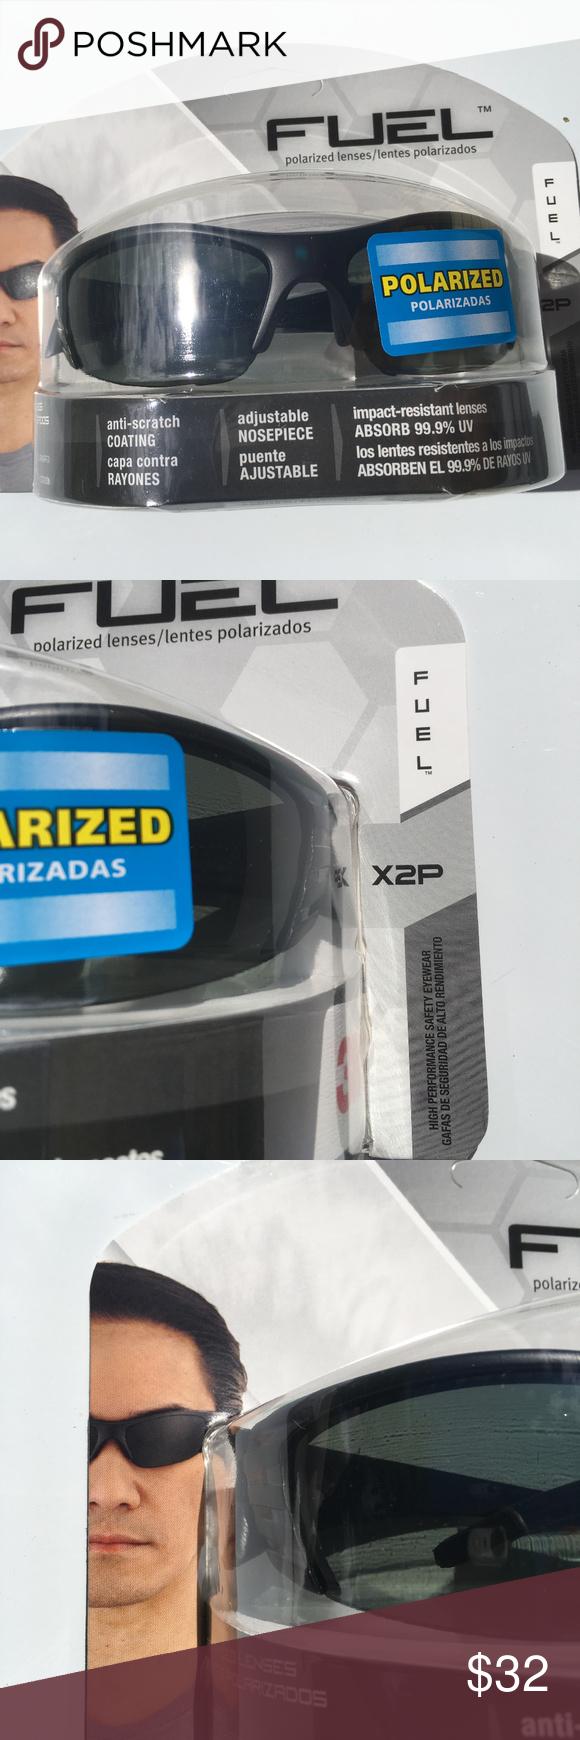 3M Fuel X2P black Polarized Safety Sun Glasses NWT